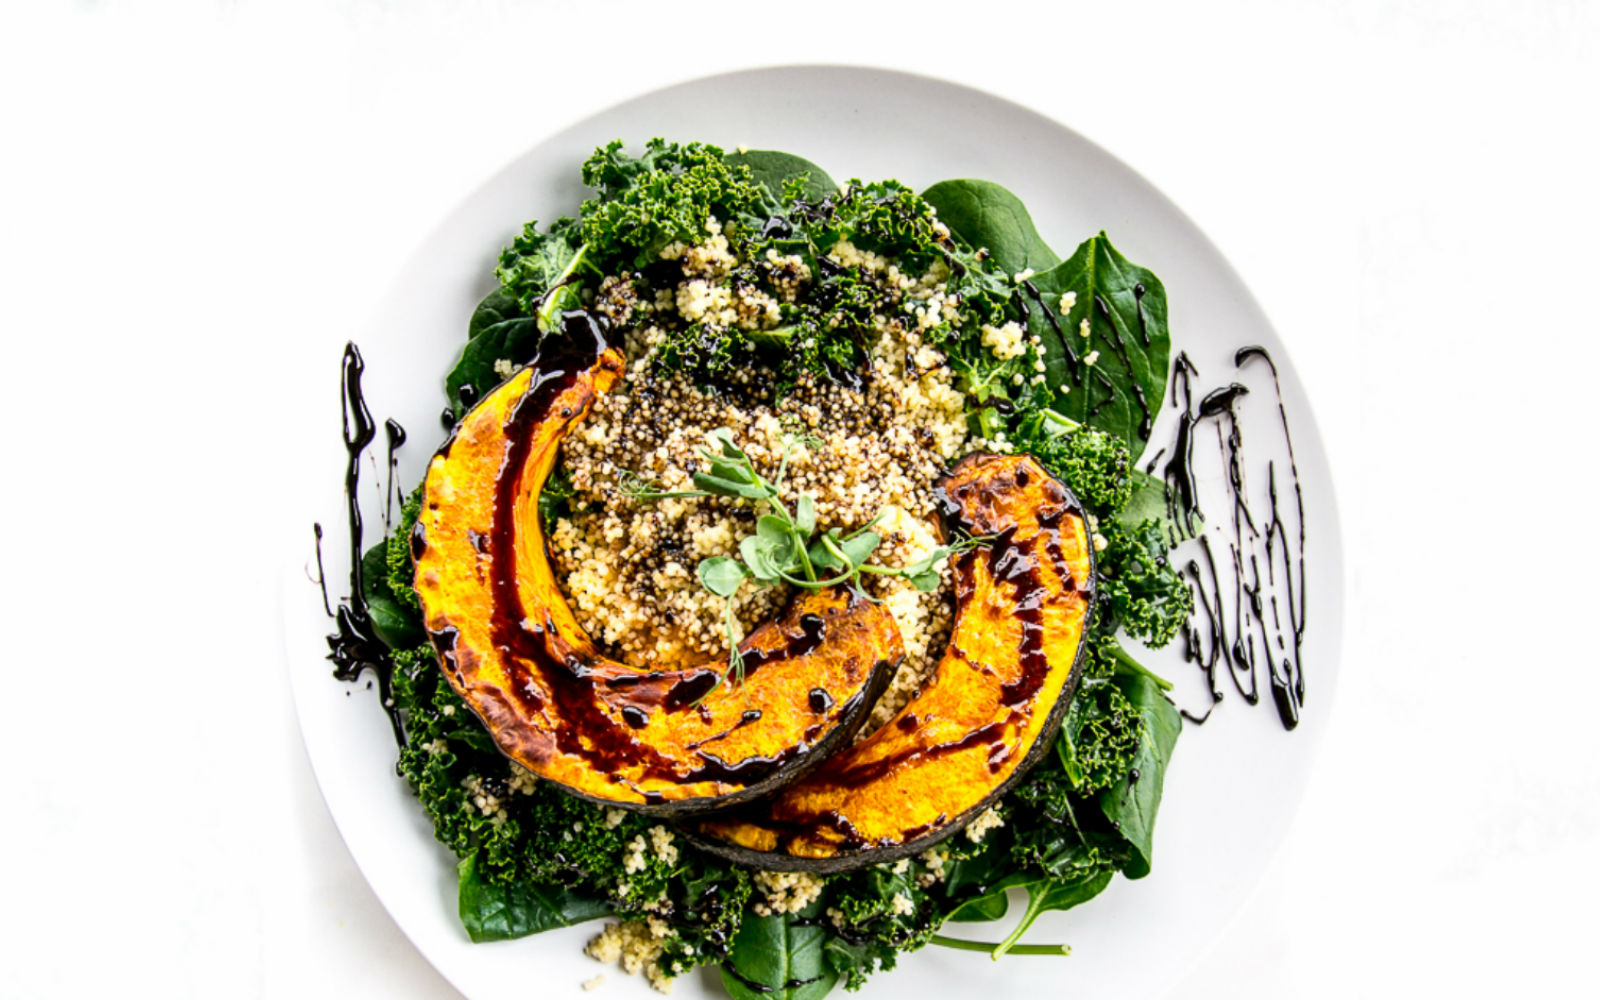 Vegan Gluten-Free Pumpkin, Millet and Kale Salad with Balsamic Reduction